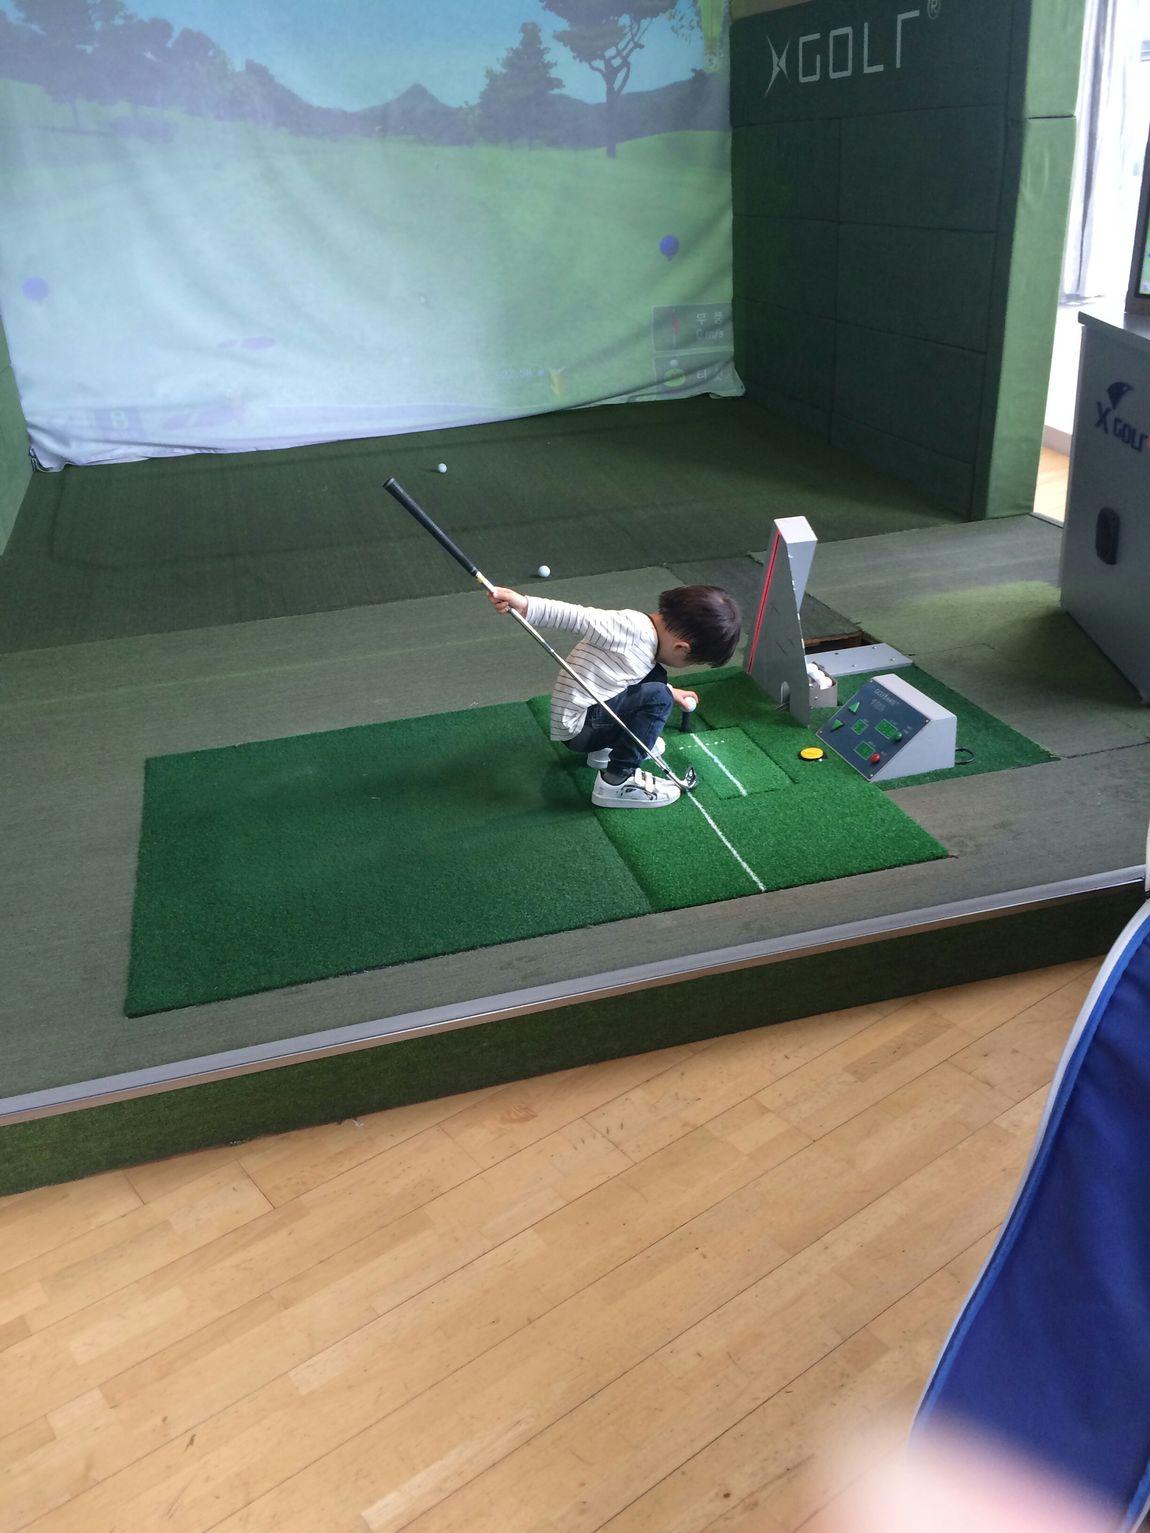 Golf Hanging Out Enjoying Life Relaxing